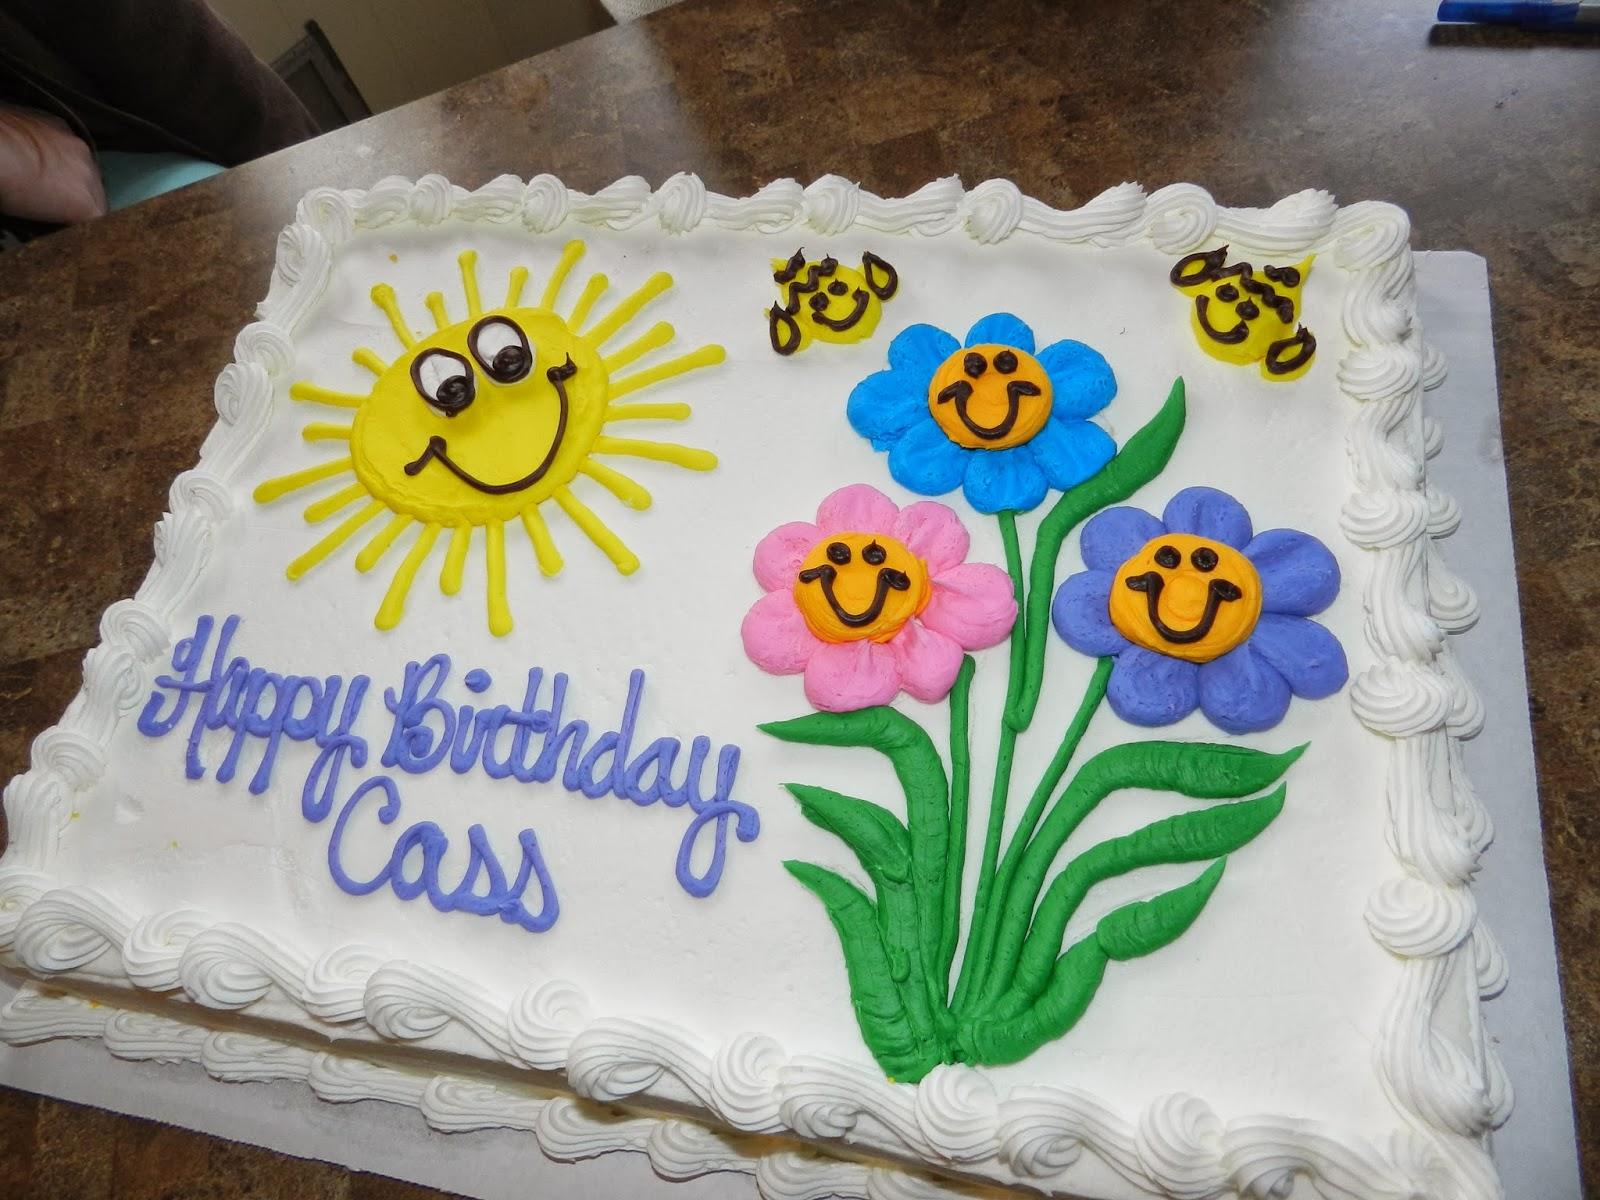 Happy Birthday Cass Cake